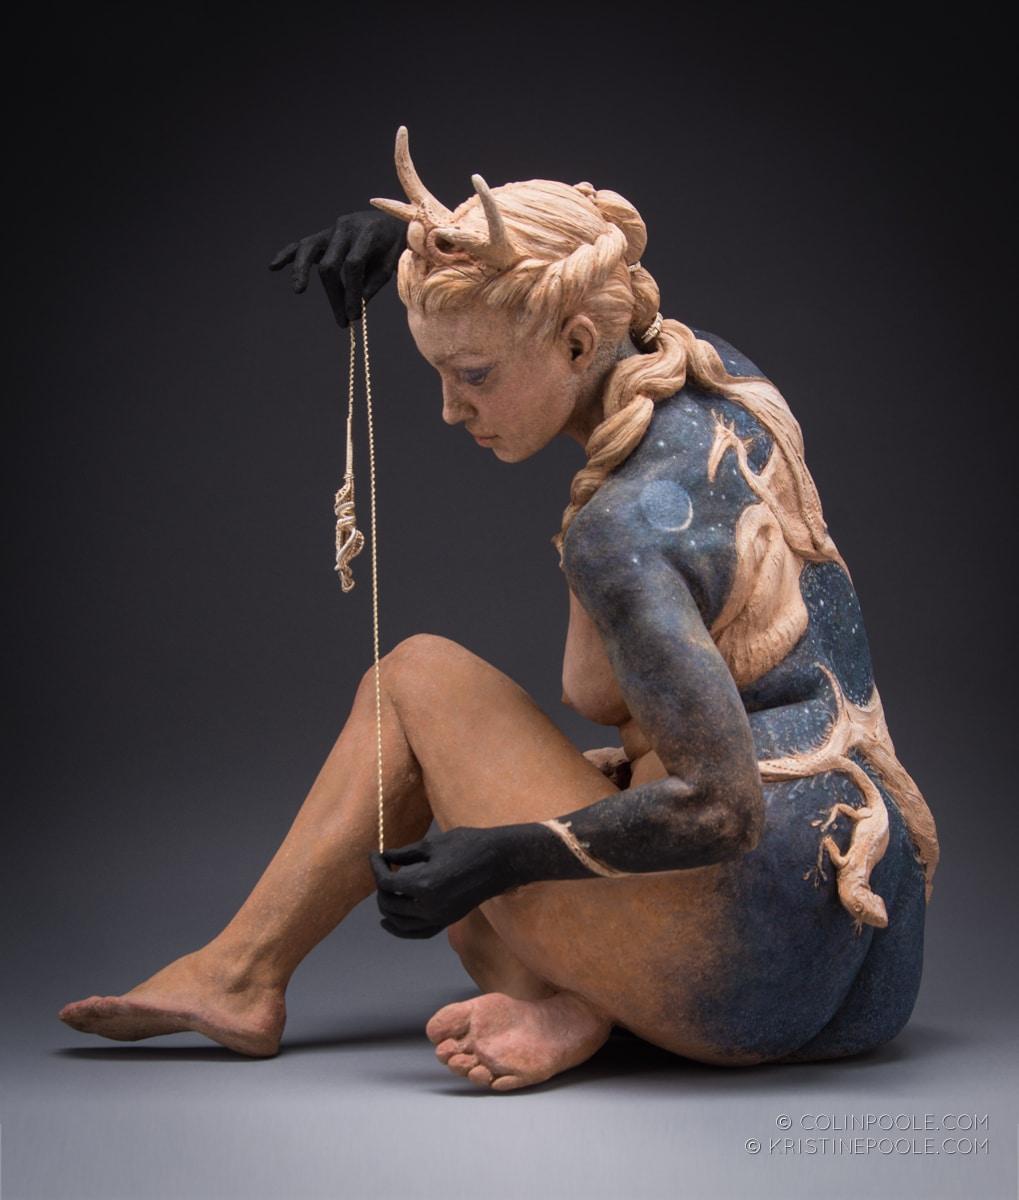 Award Winning Sculpture from the Beautiful Bizarre Magazine Art Prize